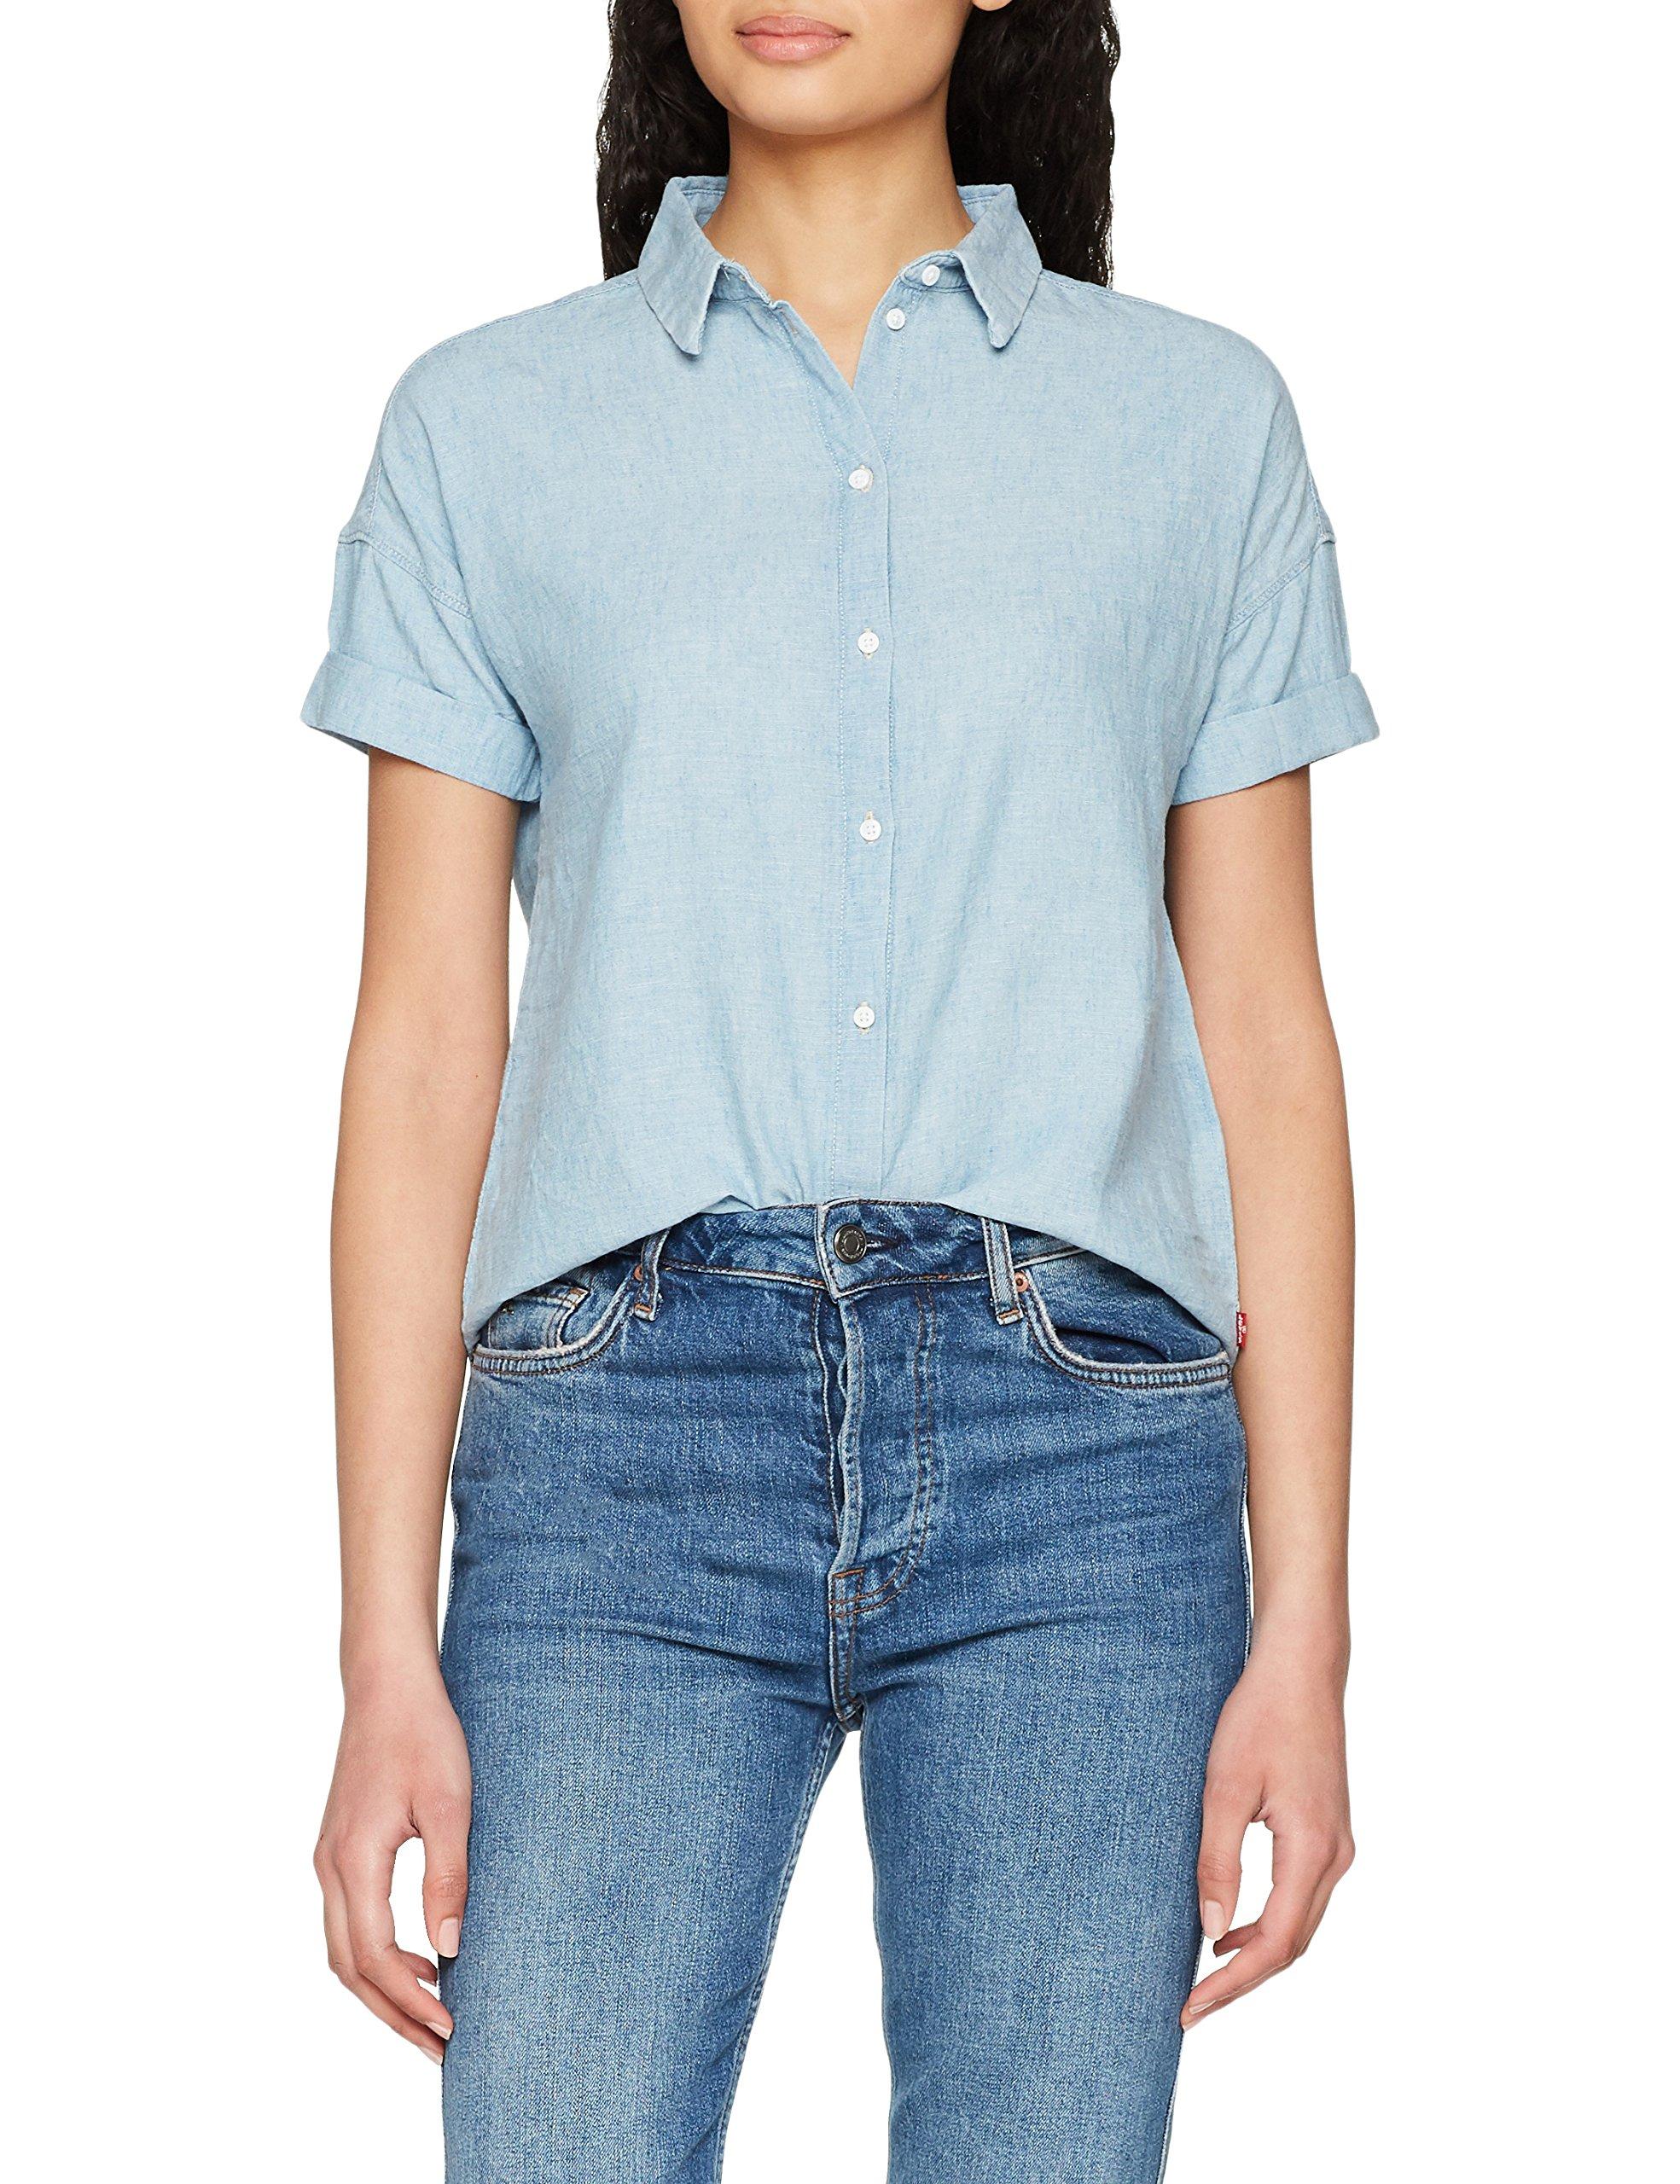 Wash Levi's 0000Large Femme Shirt Harper ChemiseBleulight Mid 0wOmNnv8